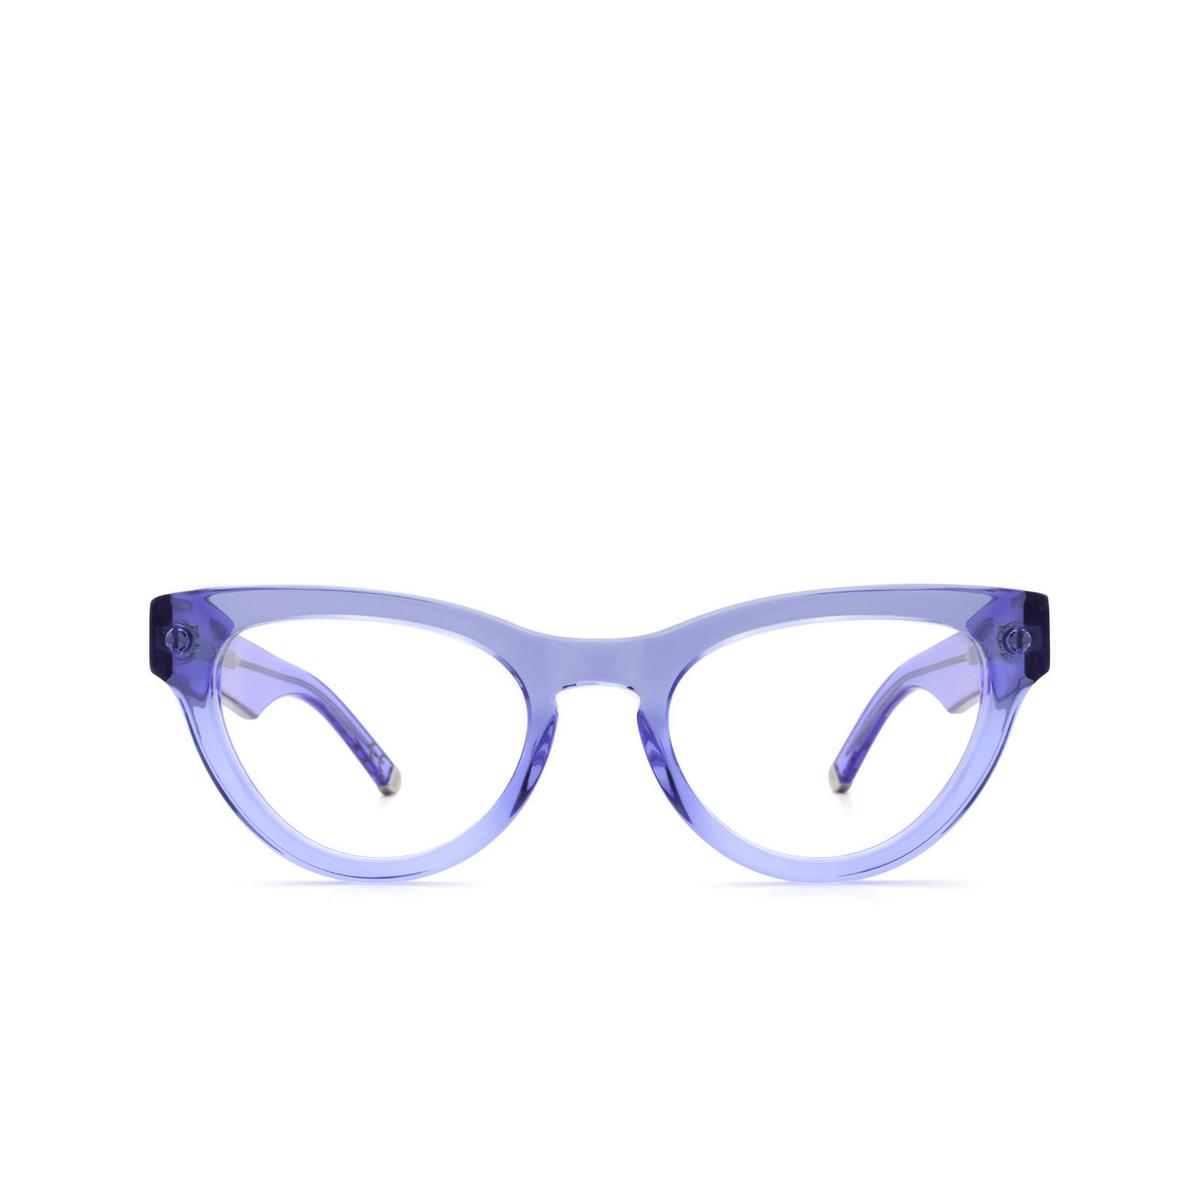 Retrosuperfuture® Cat-eye Eyeglasses: NUMERO 64 color Crystal Celeste U3A - front view.